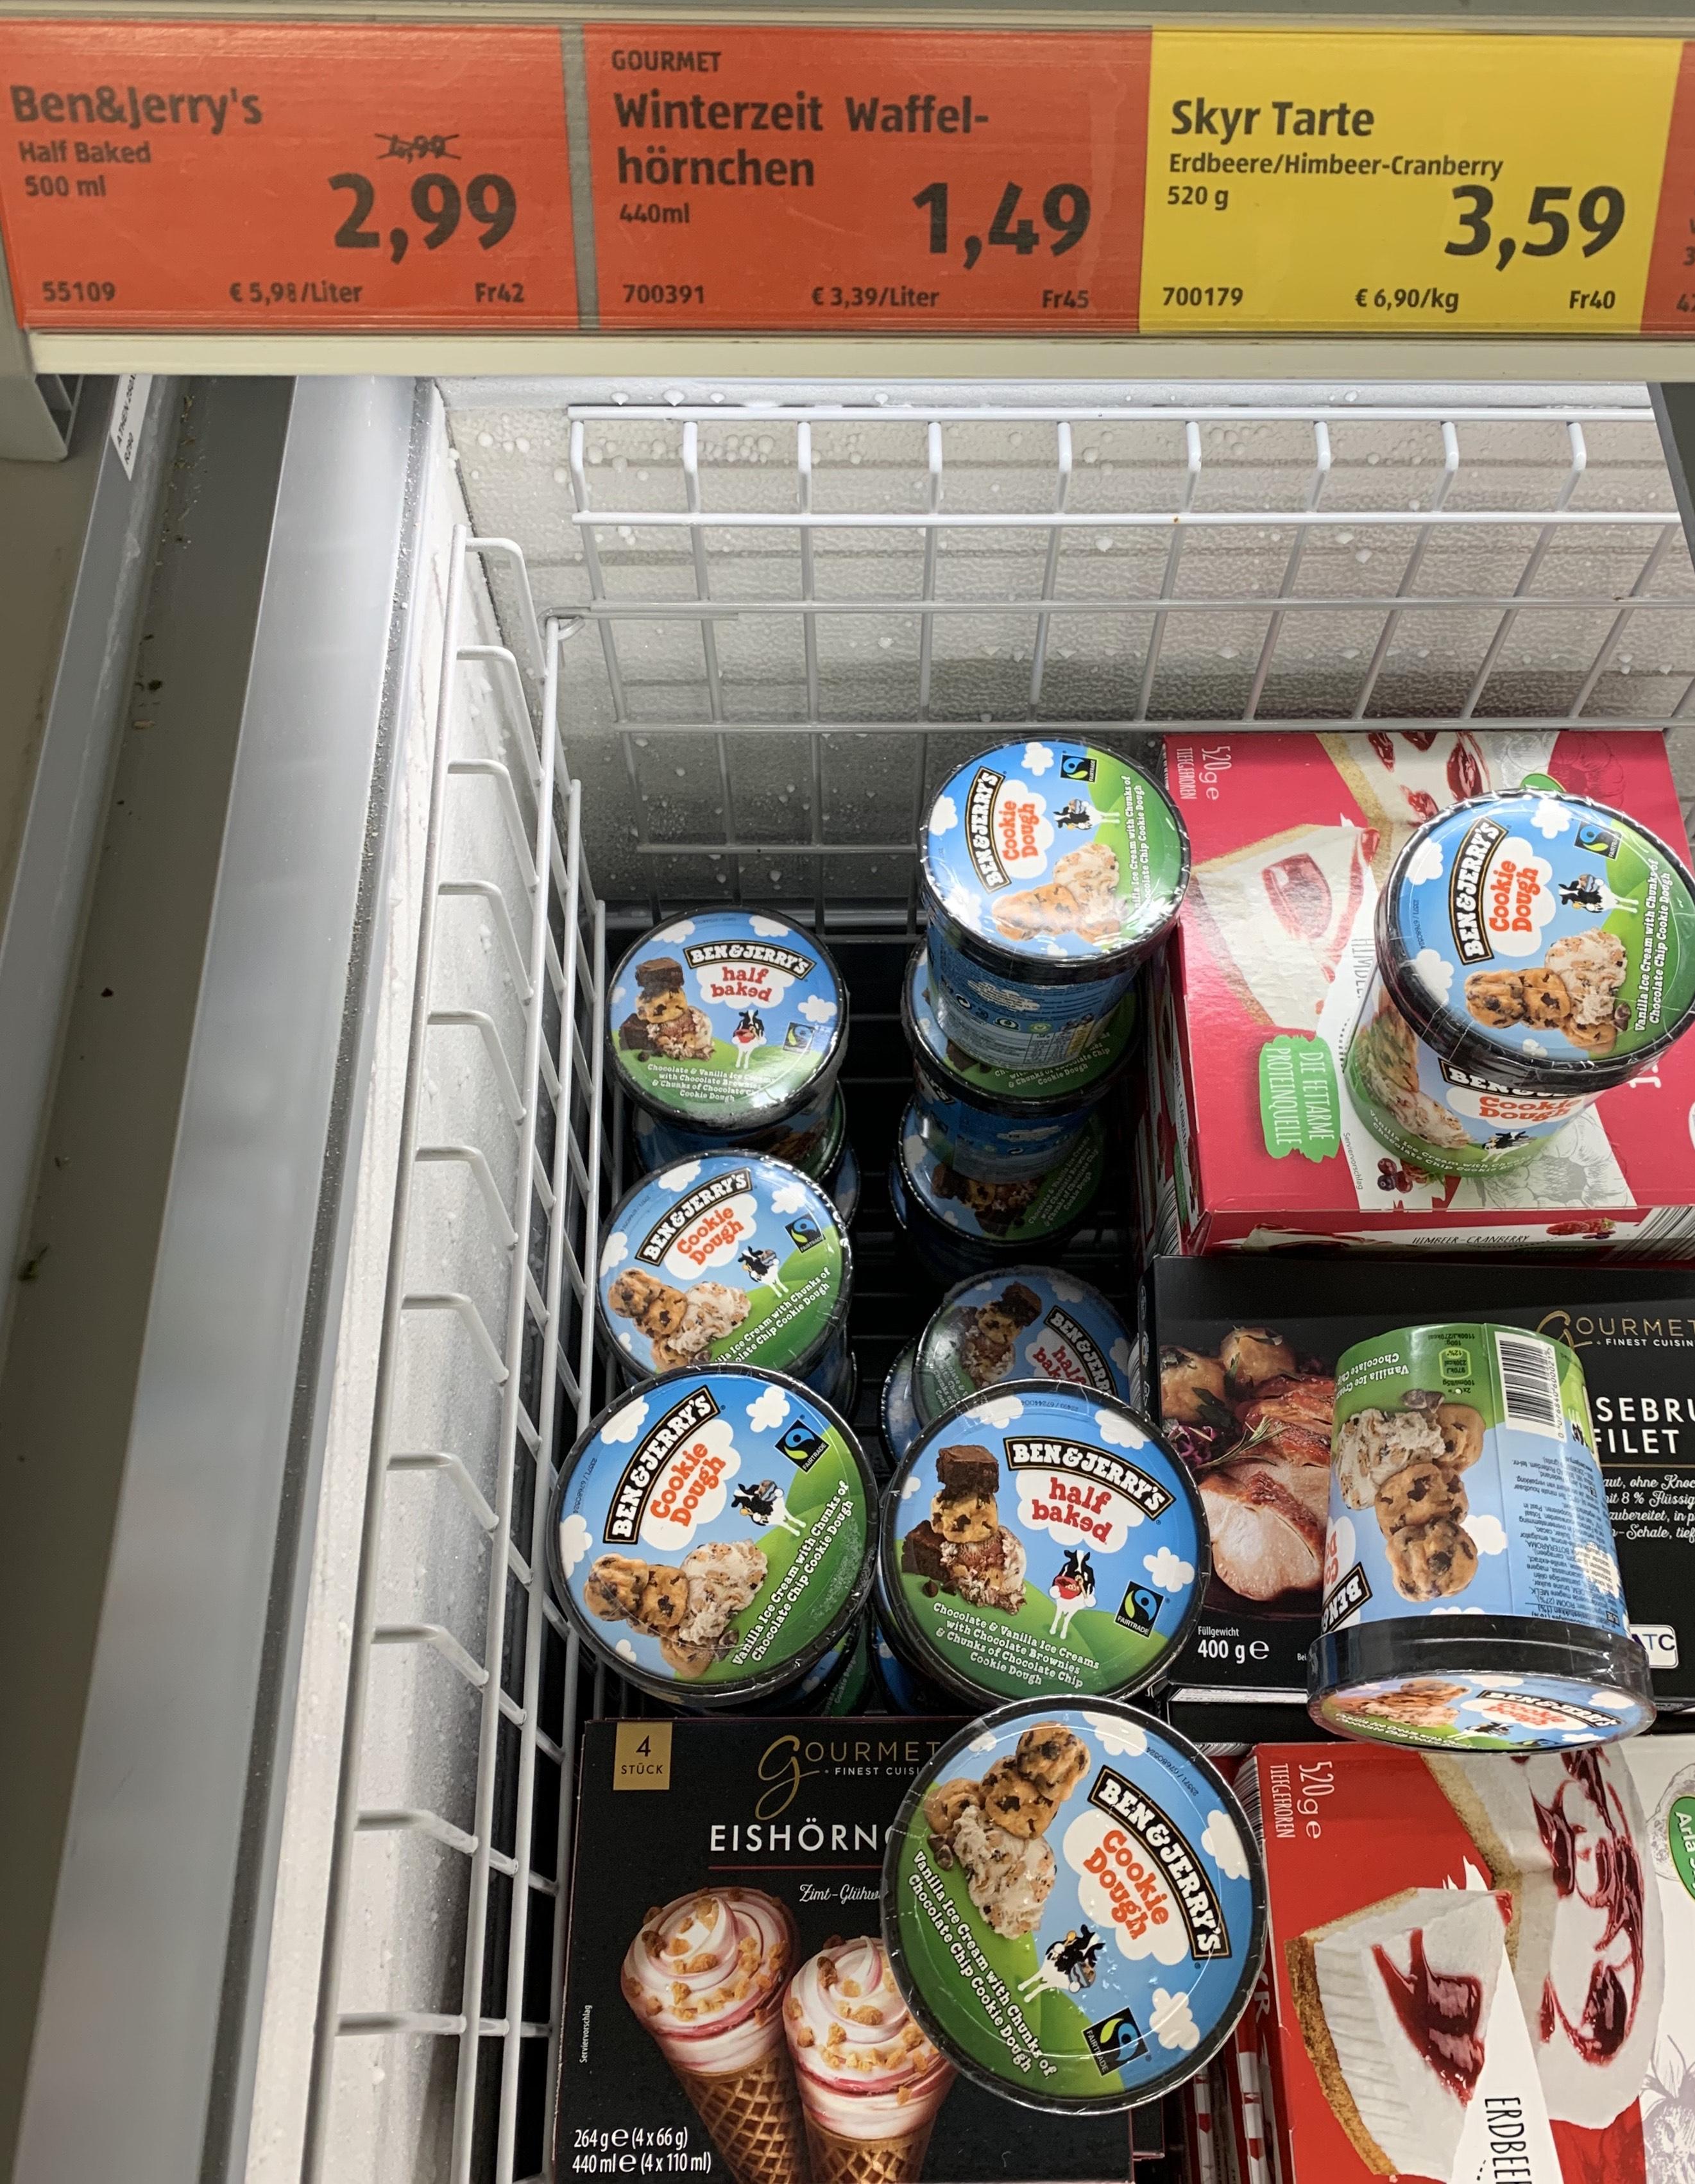 [Offline - Aldi Süd] Ben & Jerry's Eiscreme Cookie Dough / Half Baked